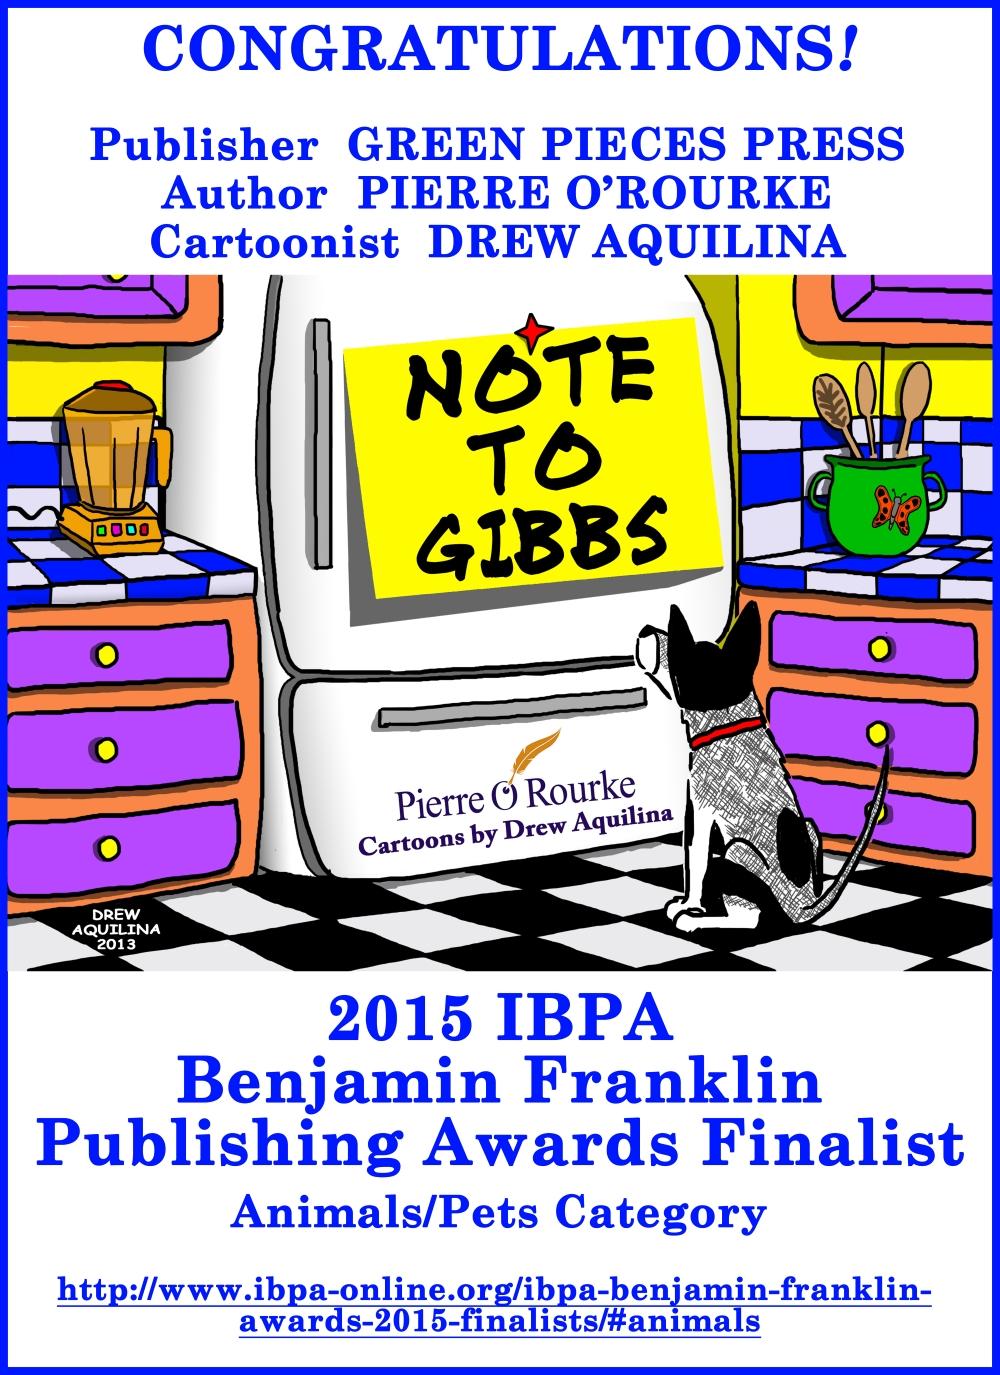 Note To Gibbs 2015 IBPA Benjamin Franklin Award Announcement web edition.jpg